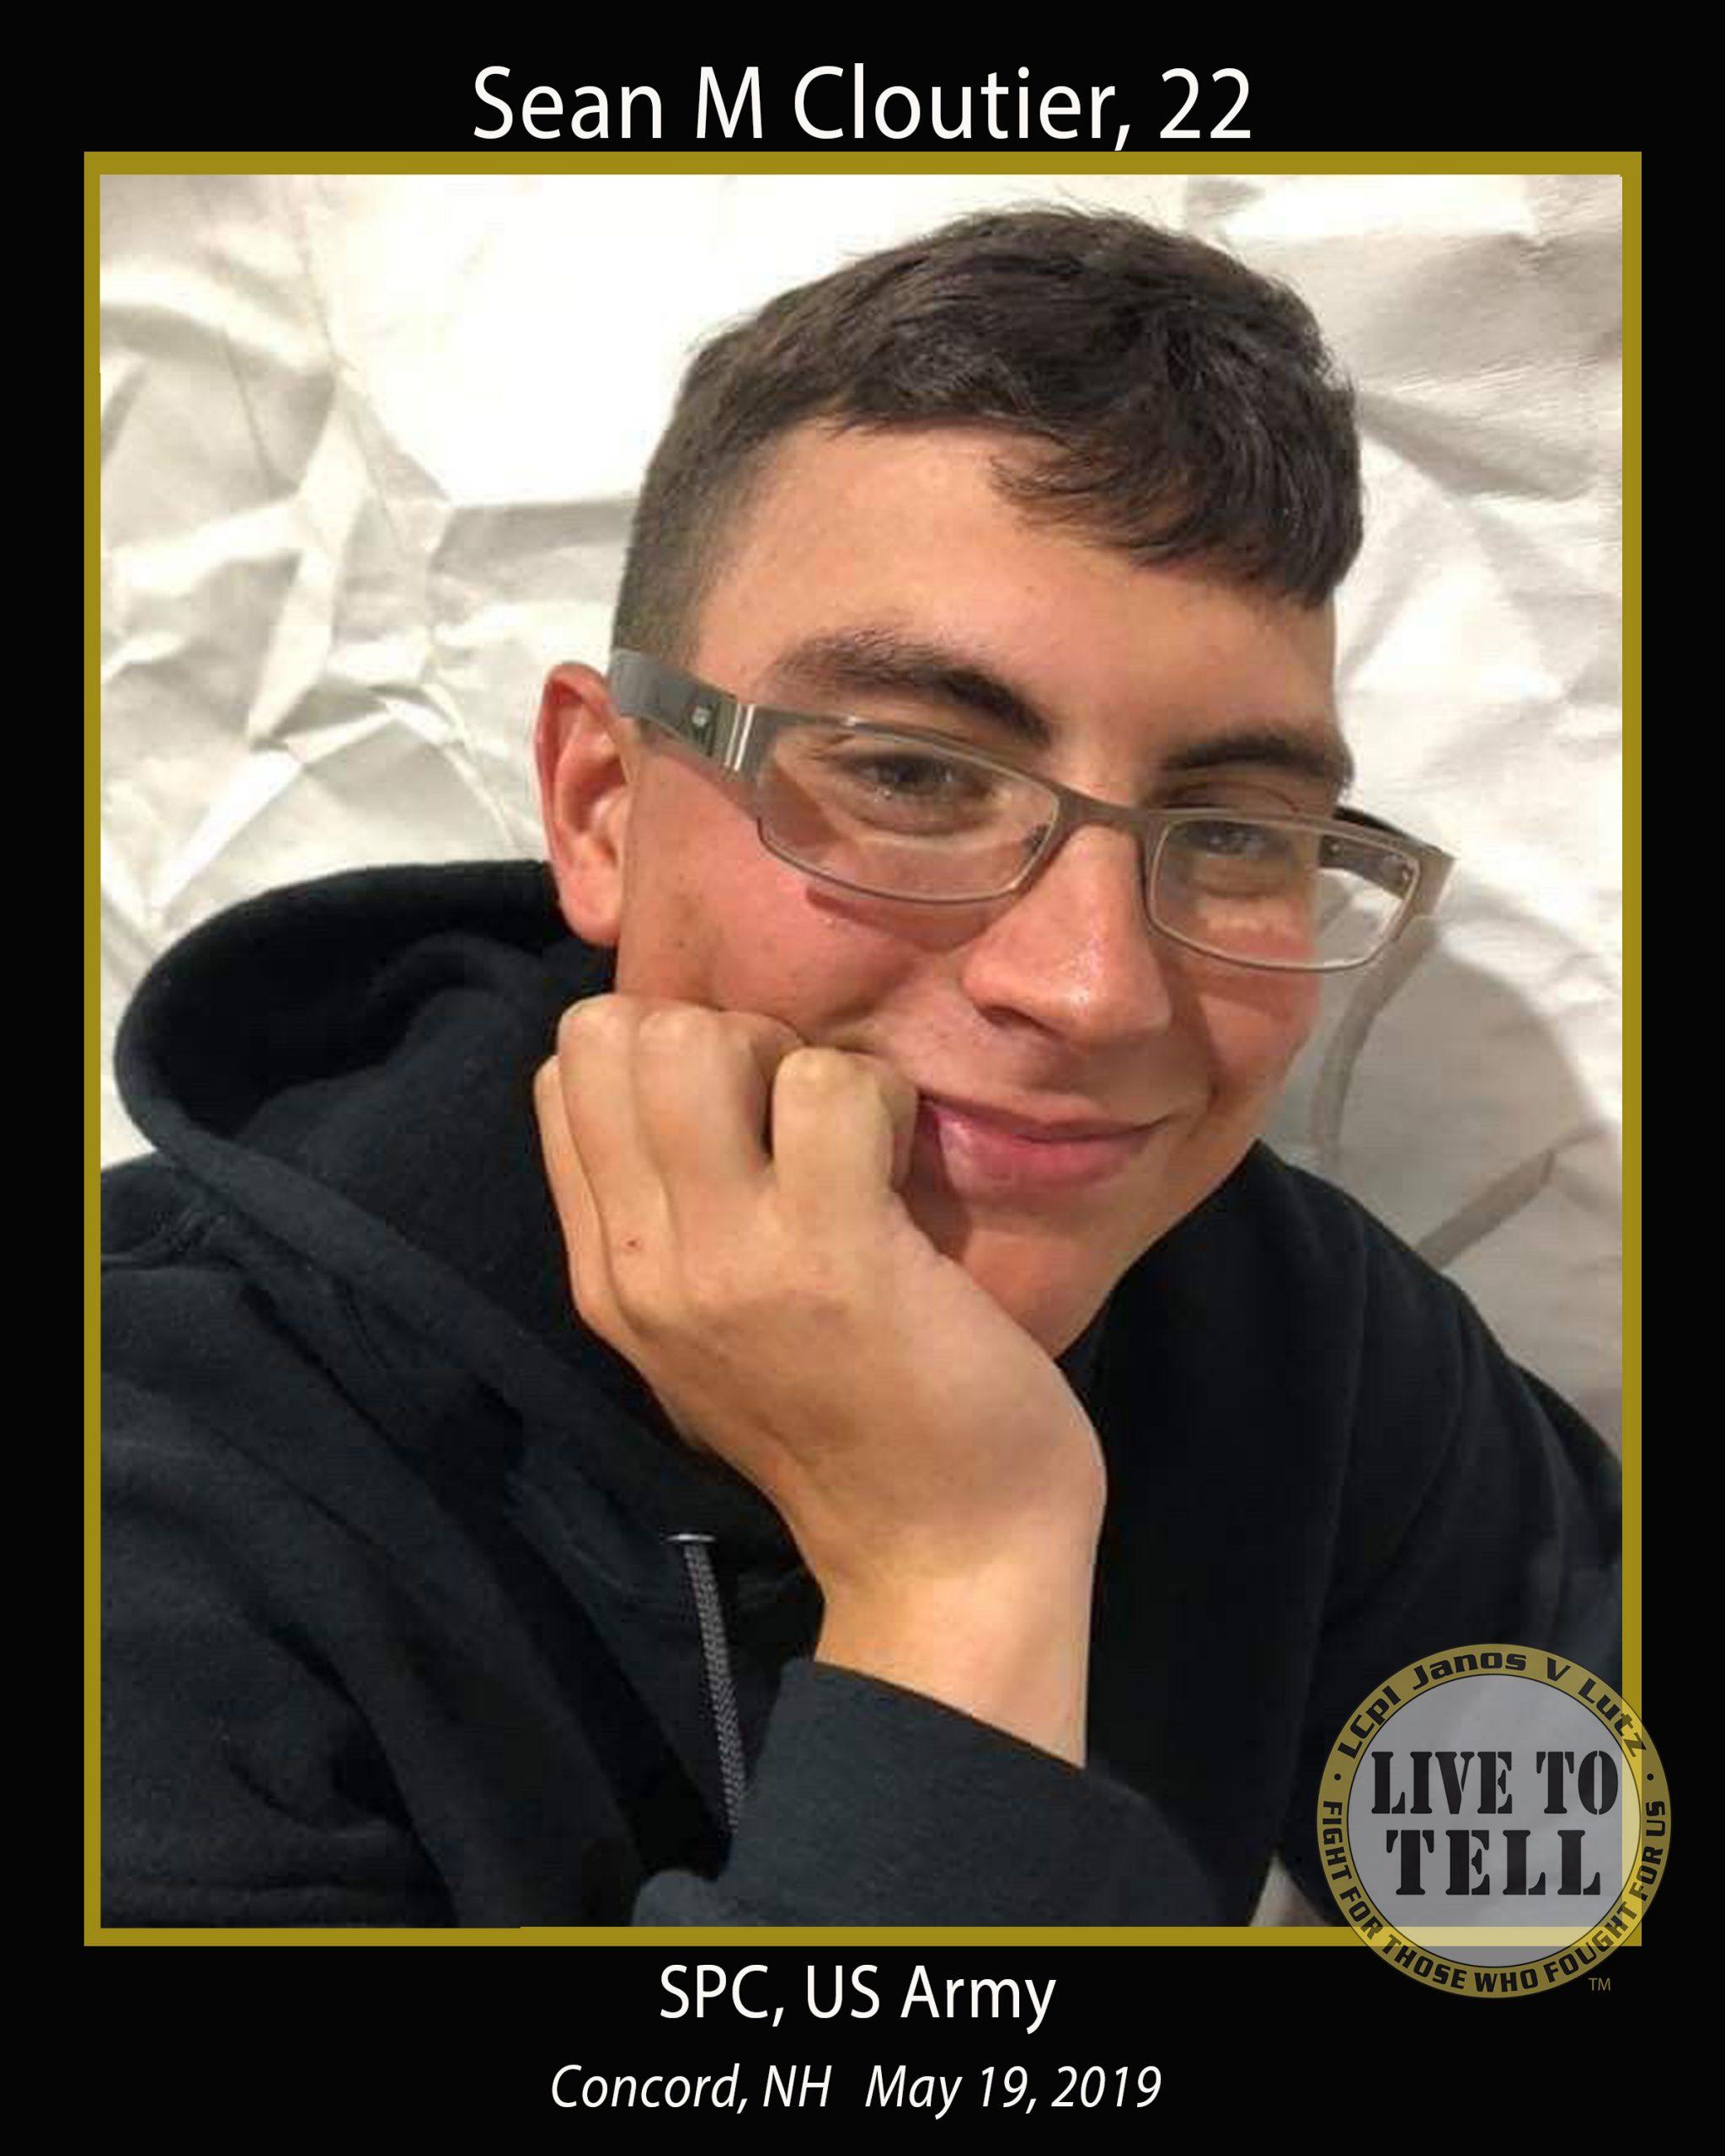 Sean M Cloutier, 22